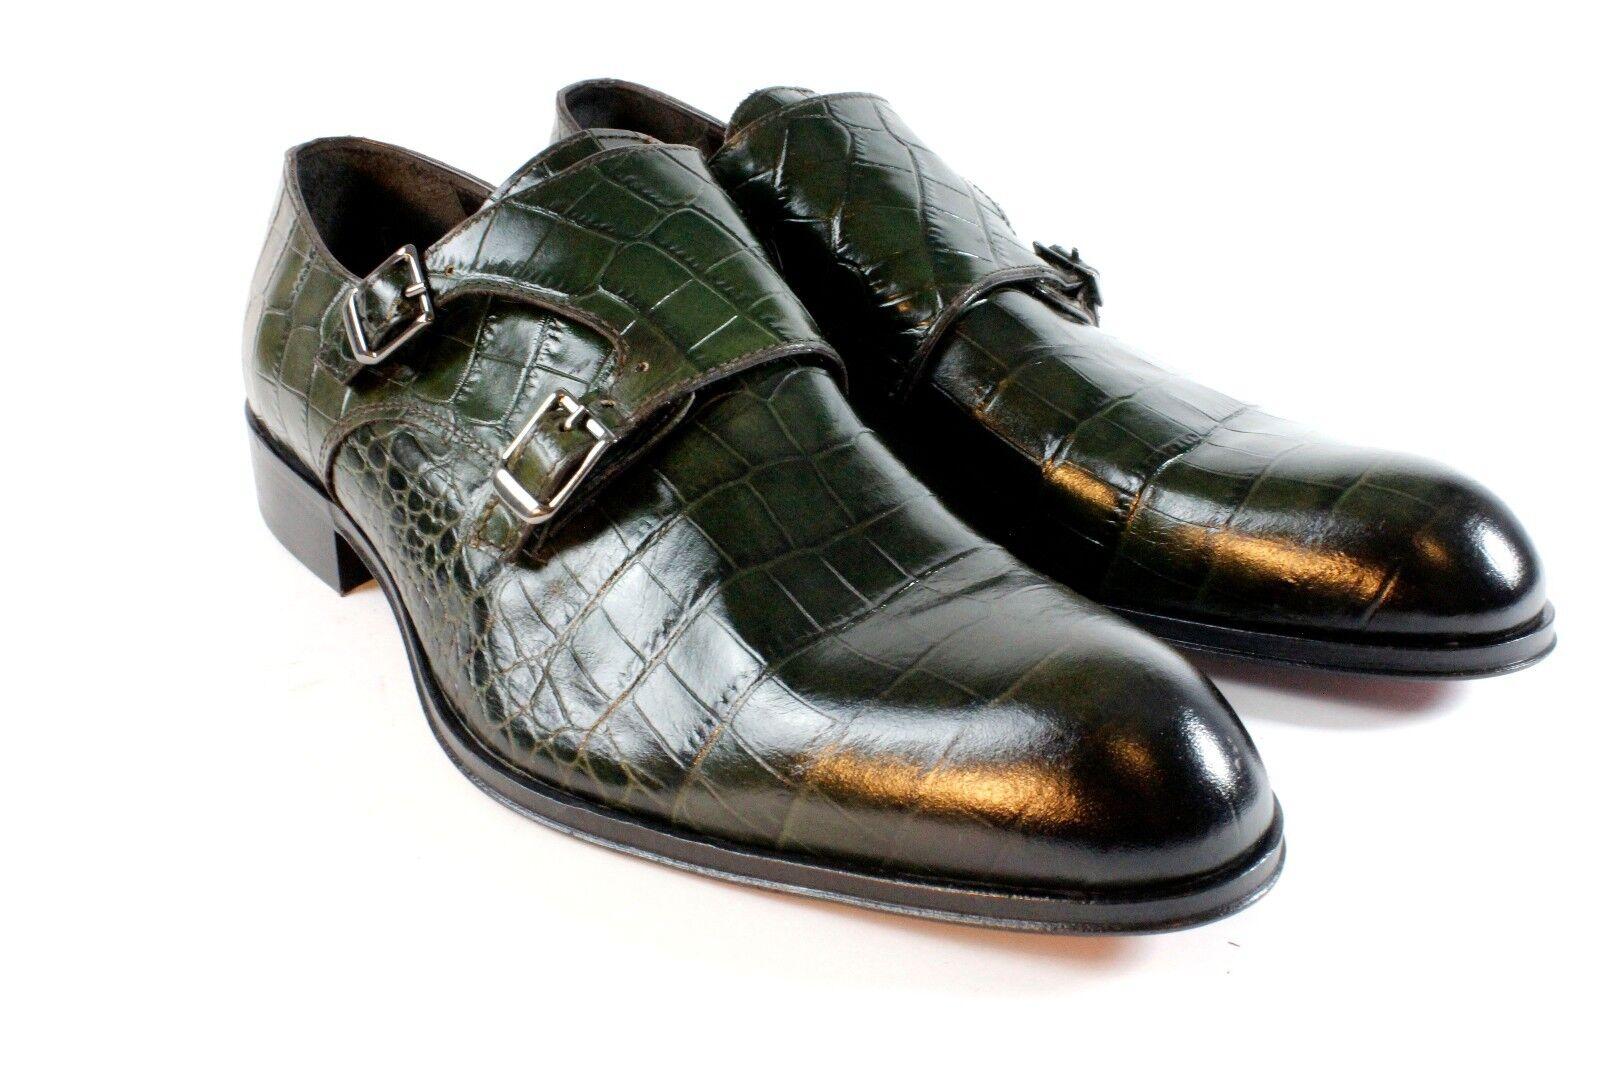 IVAN TROY Green Crocodile Handmade Double Monk Strap Italian Leather Dress Shoes Scarpe classiche da uomo